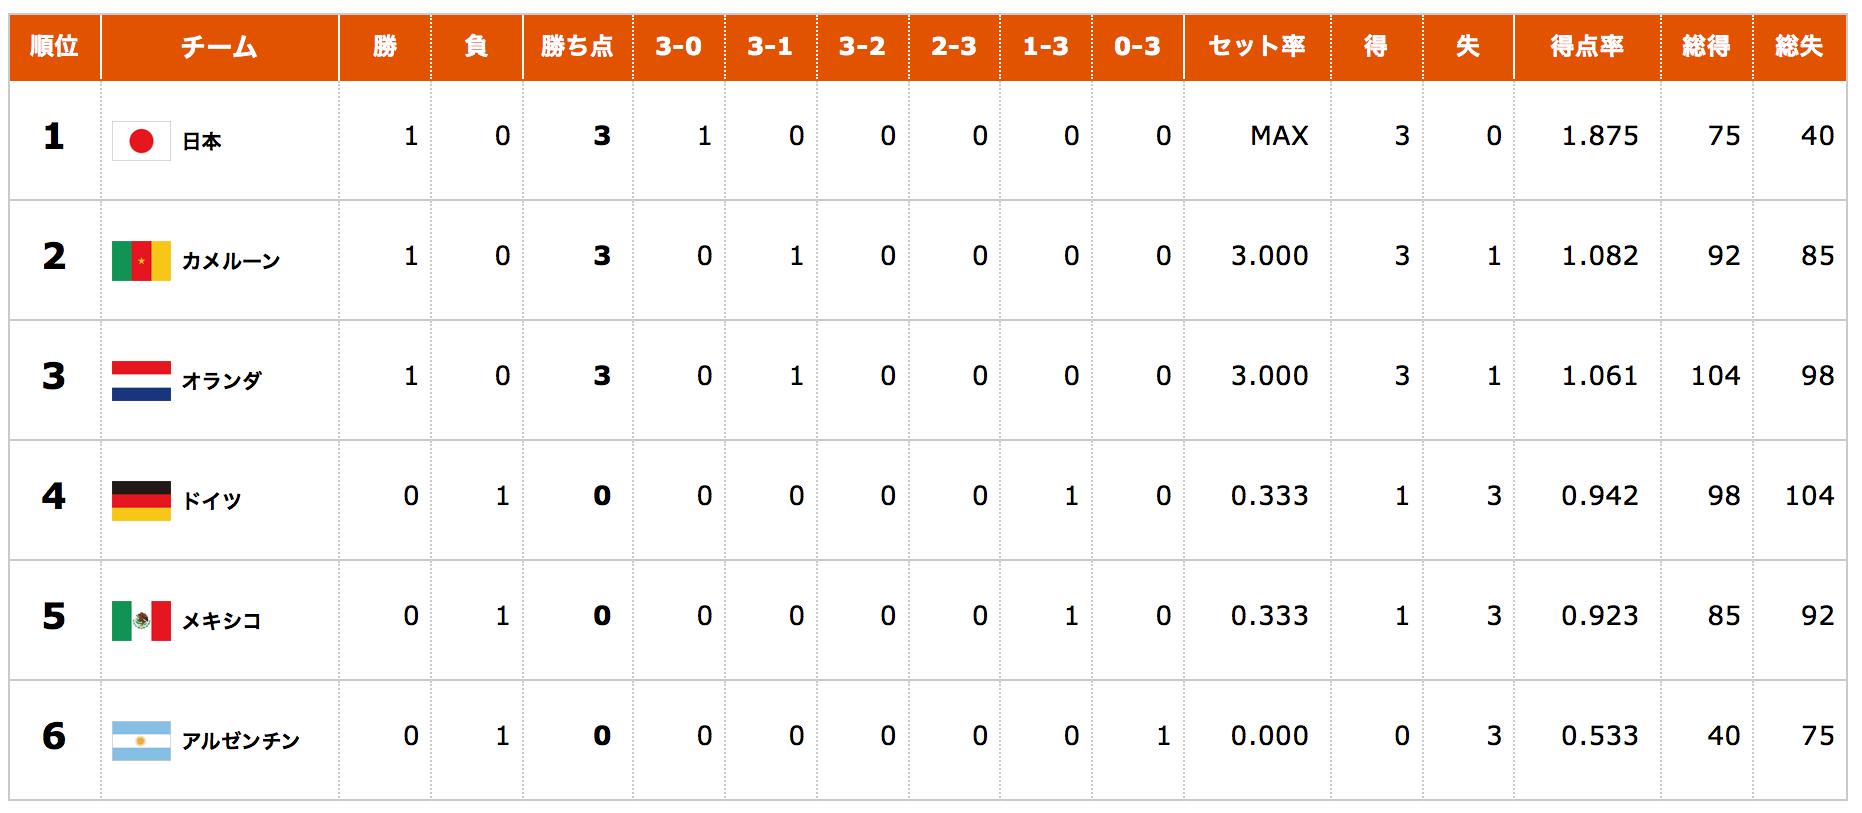 世界バレー女子勝敗表